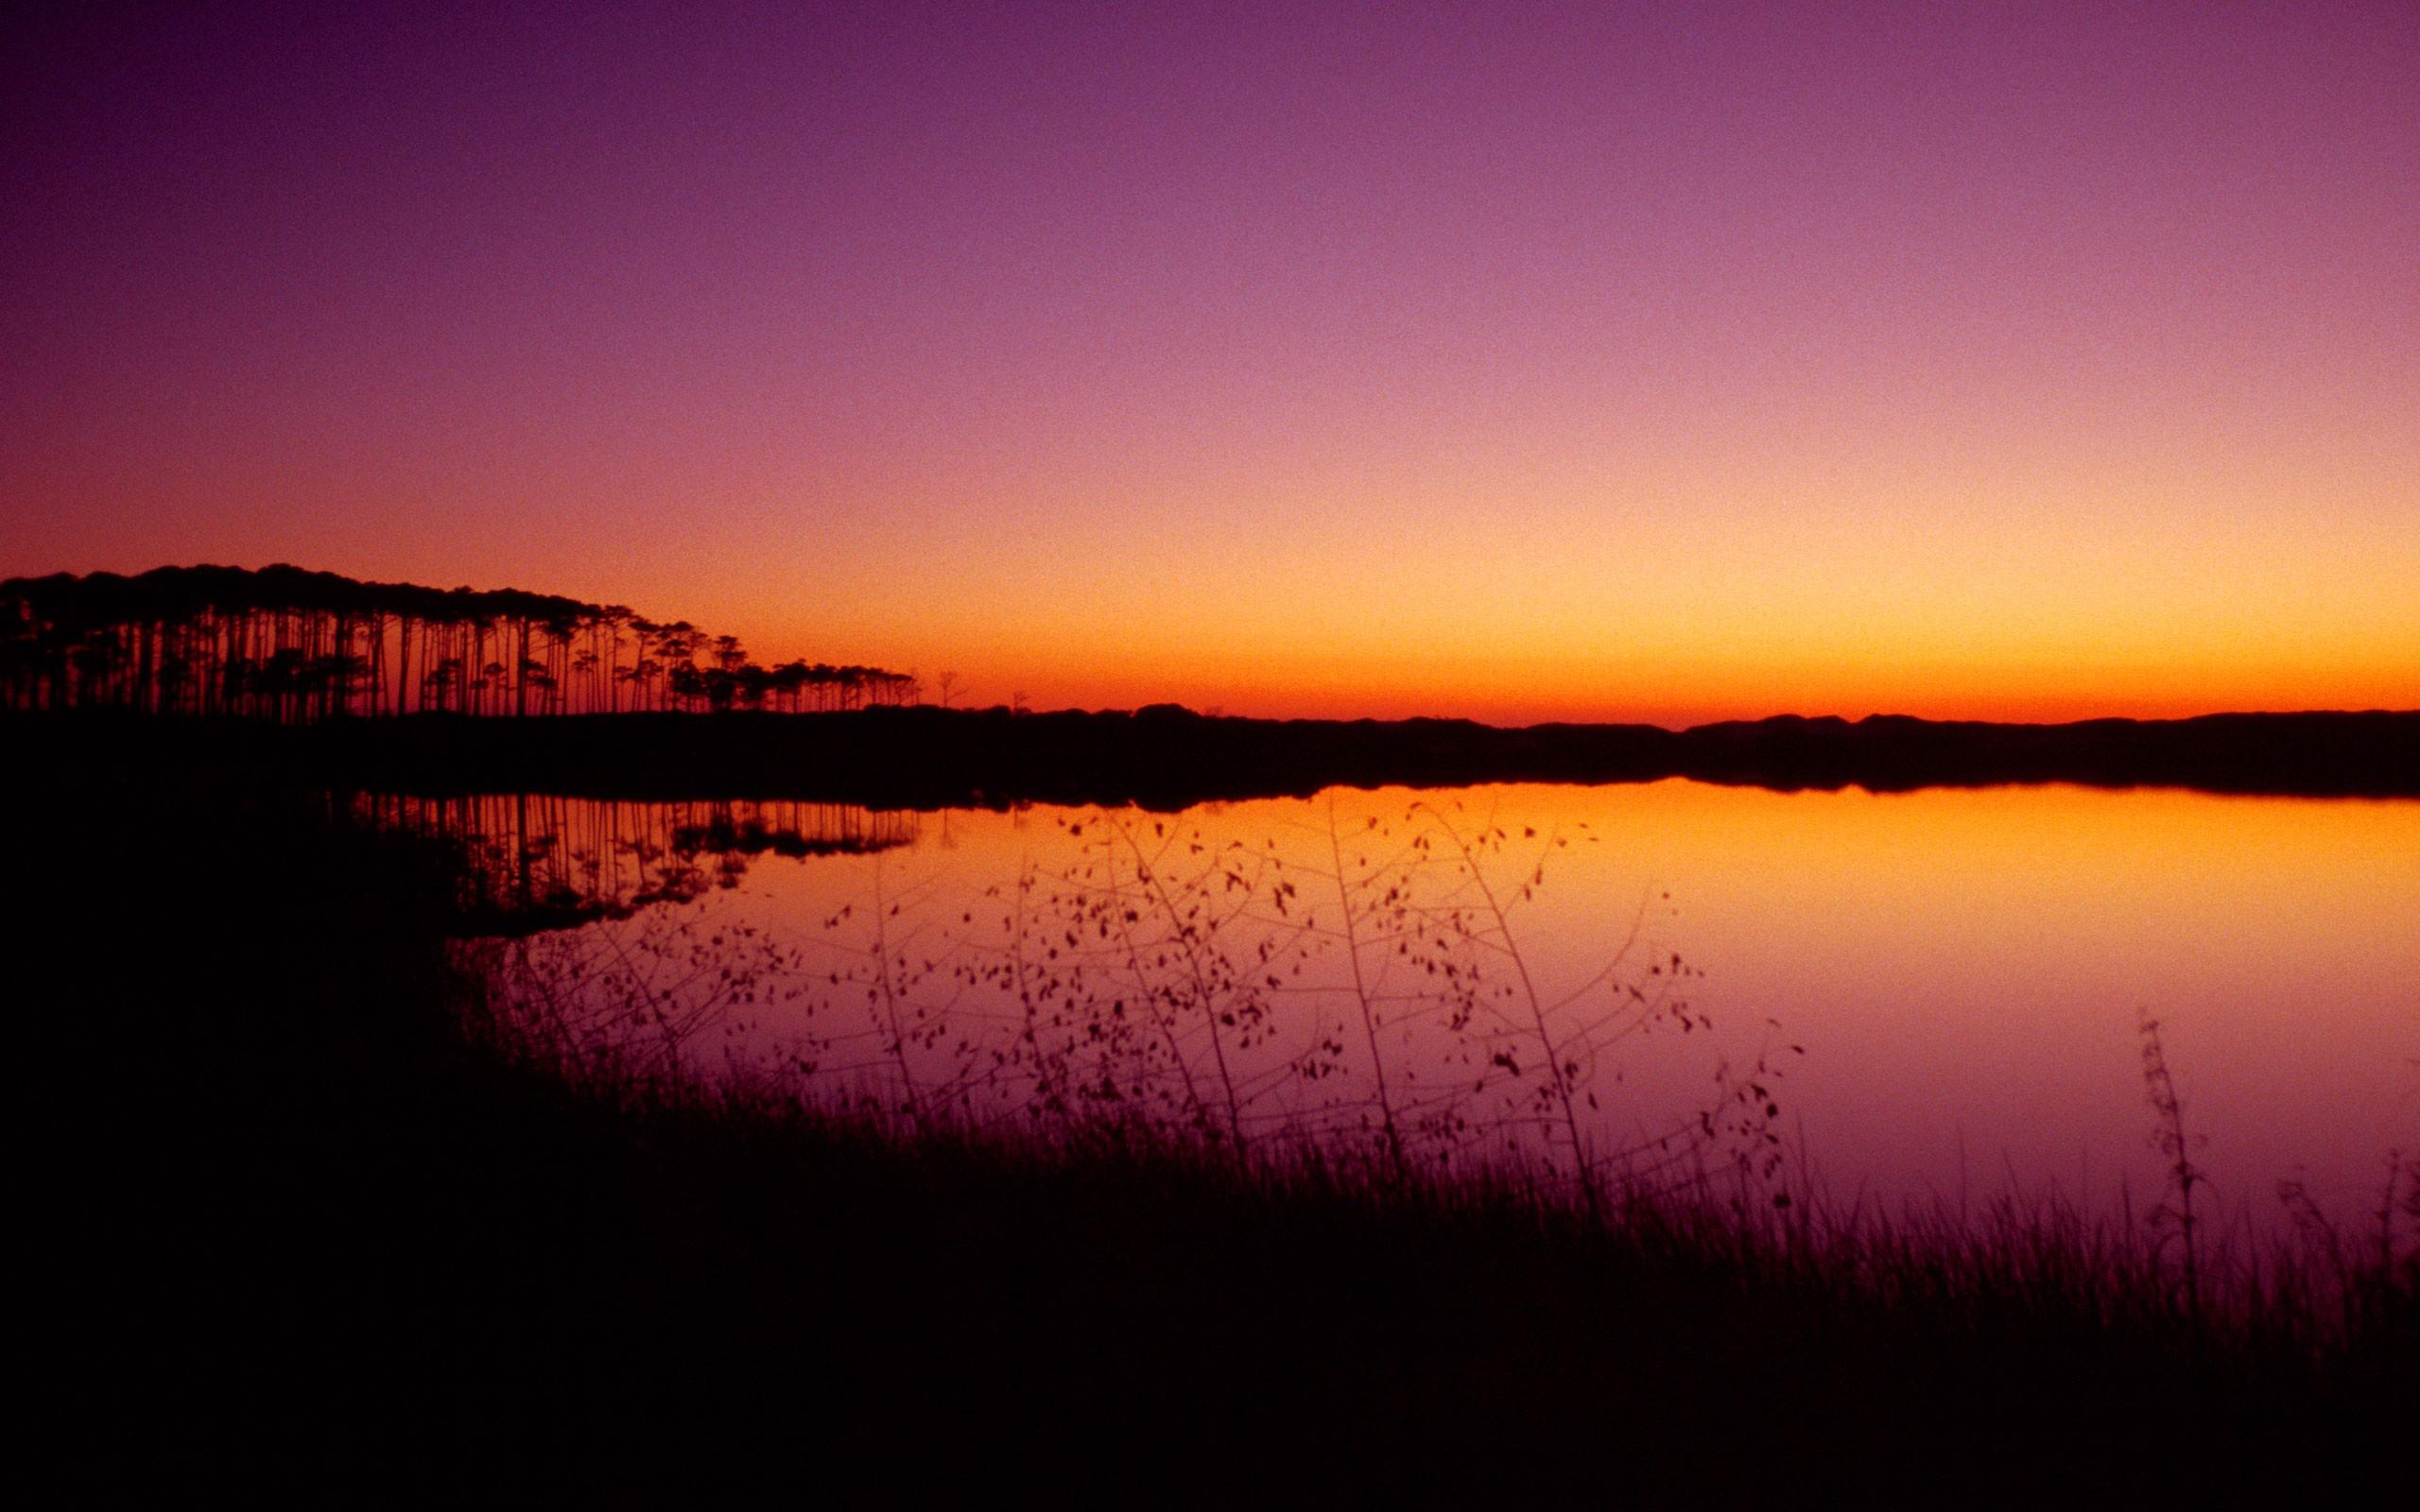 Beautiful Sunsets And Sunrises Wallpaper   WeSharePics 2560x1600